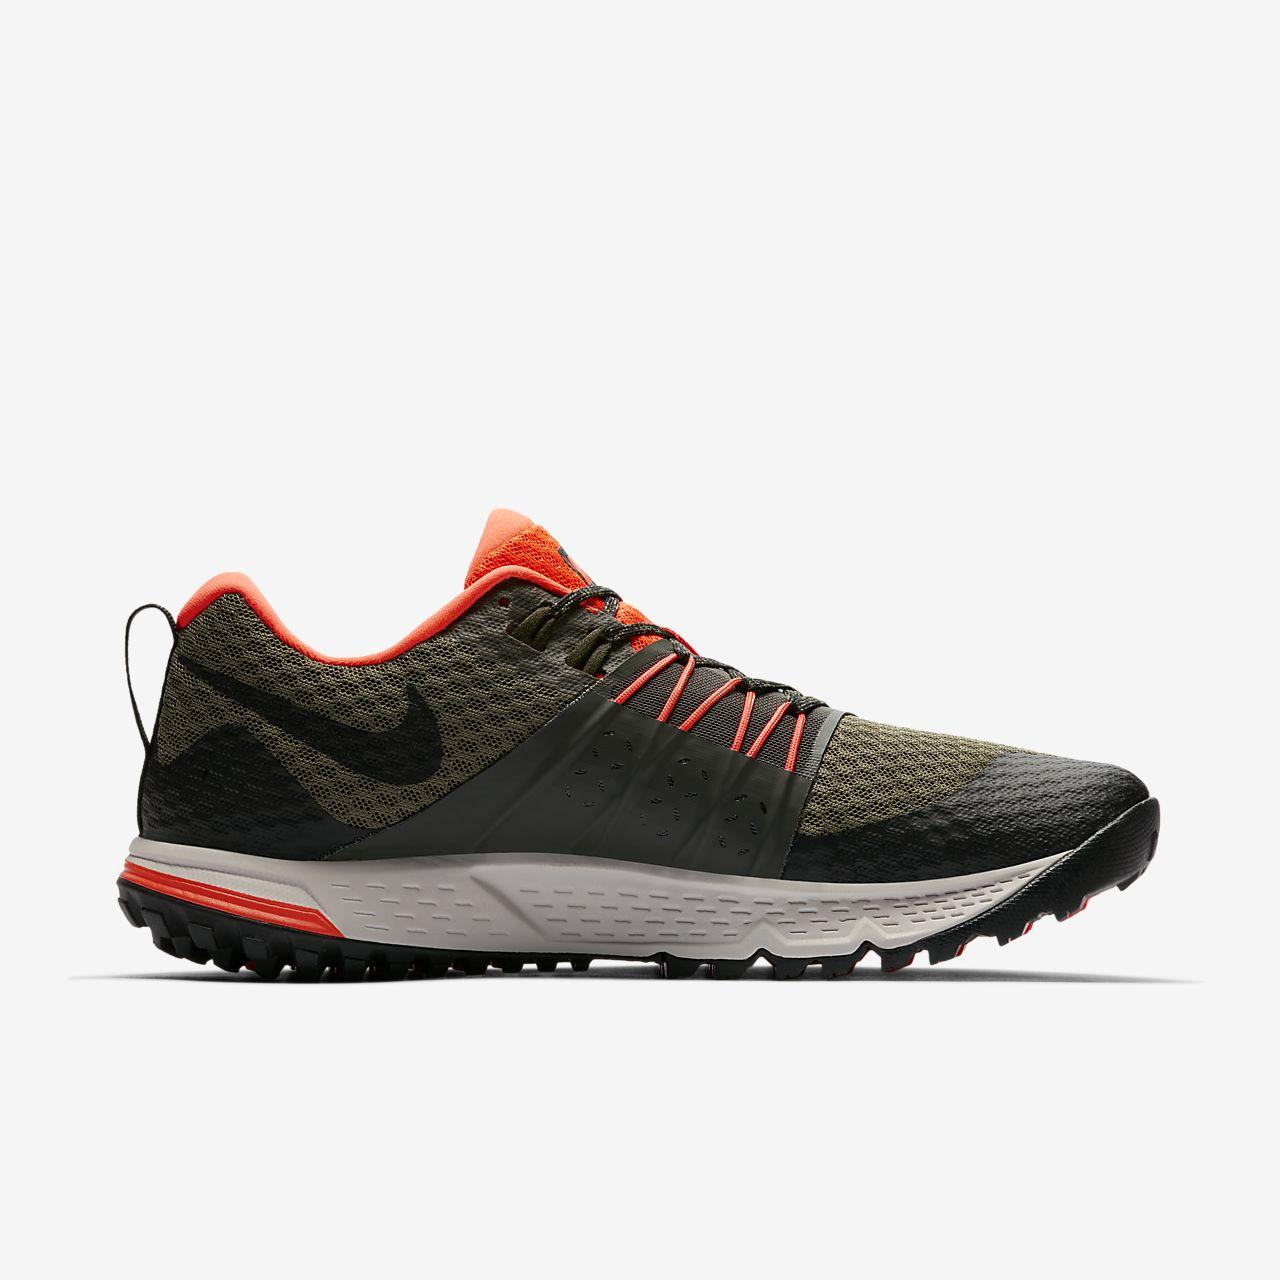 Nike - Air Zoom Wildhorse 4 Hommes chaussure de course (bleu) - EU 42,5 - US 9